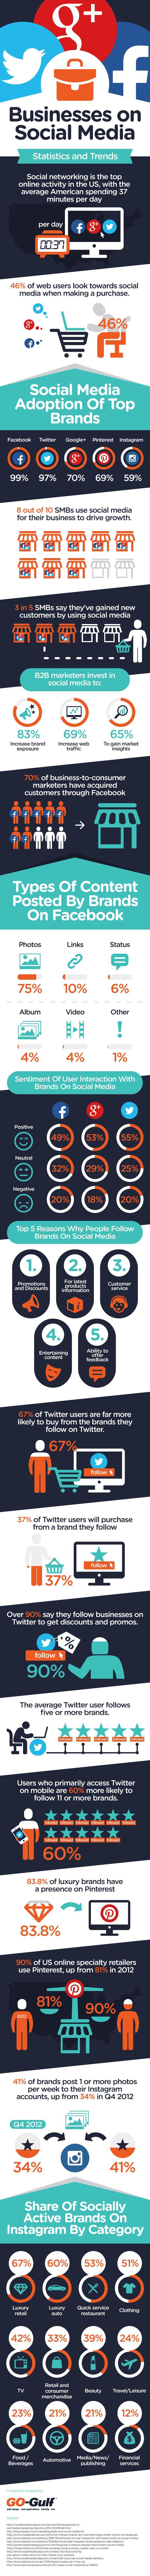 businesses-on-social-media